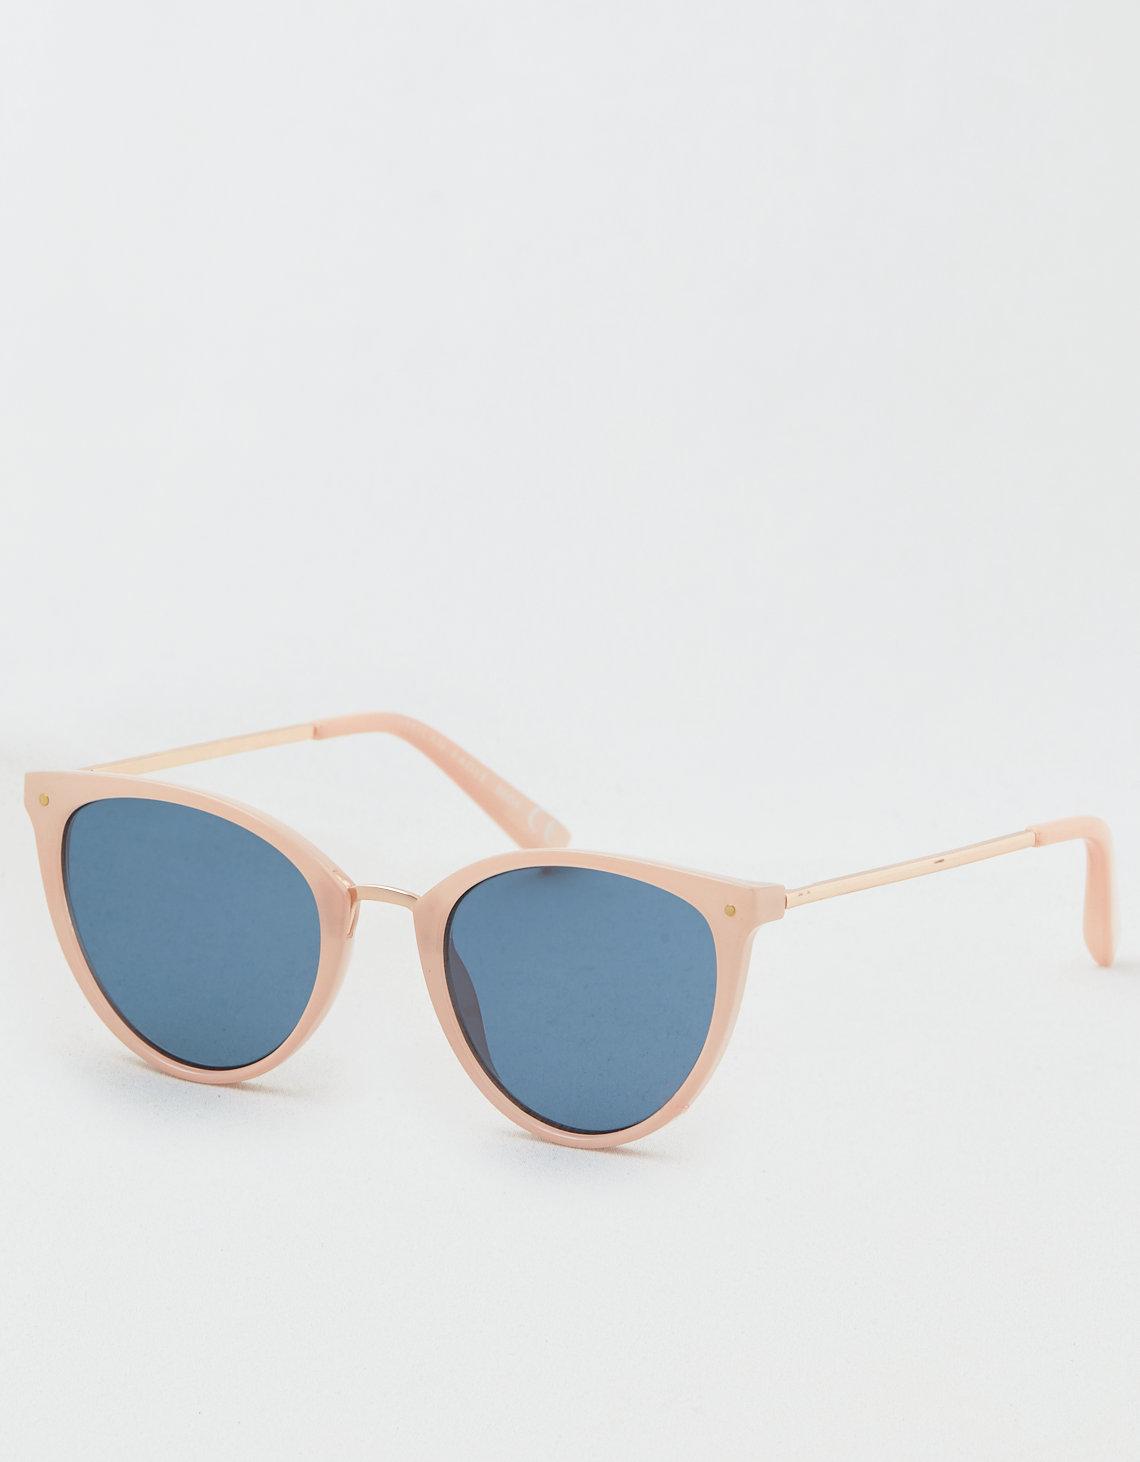 69840b421a53 AE Blush Clubmaster Sunglasses